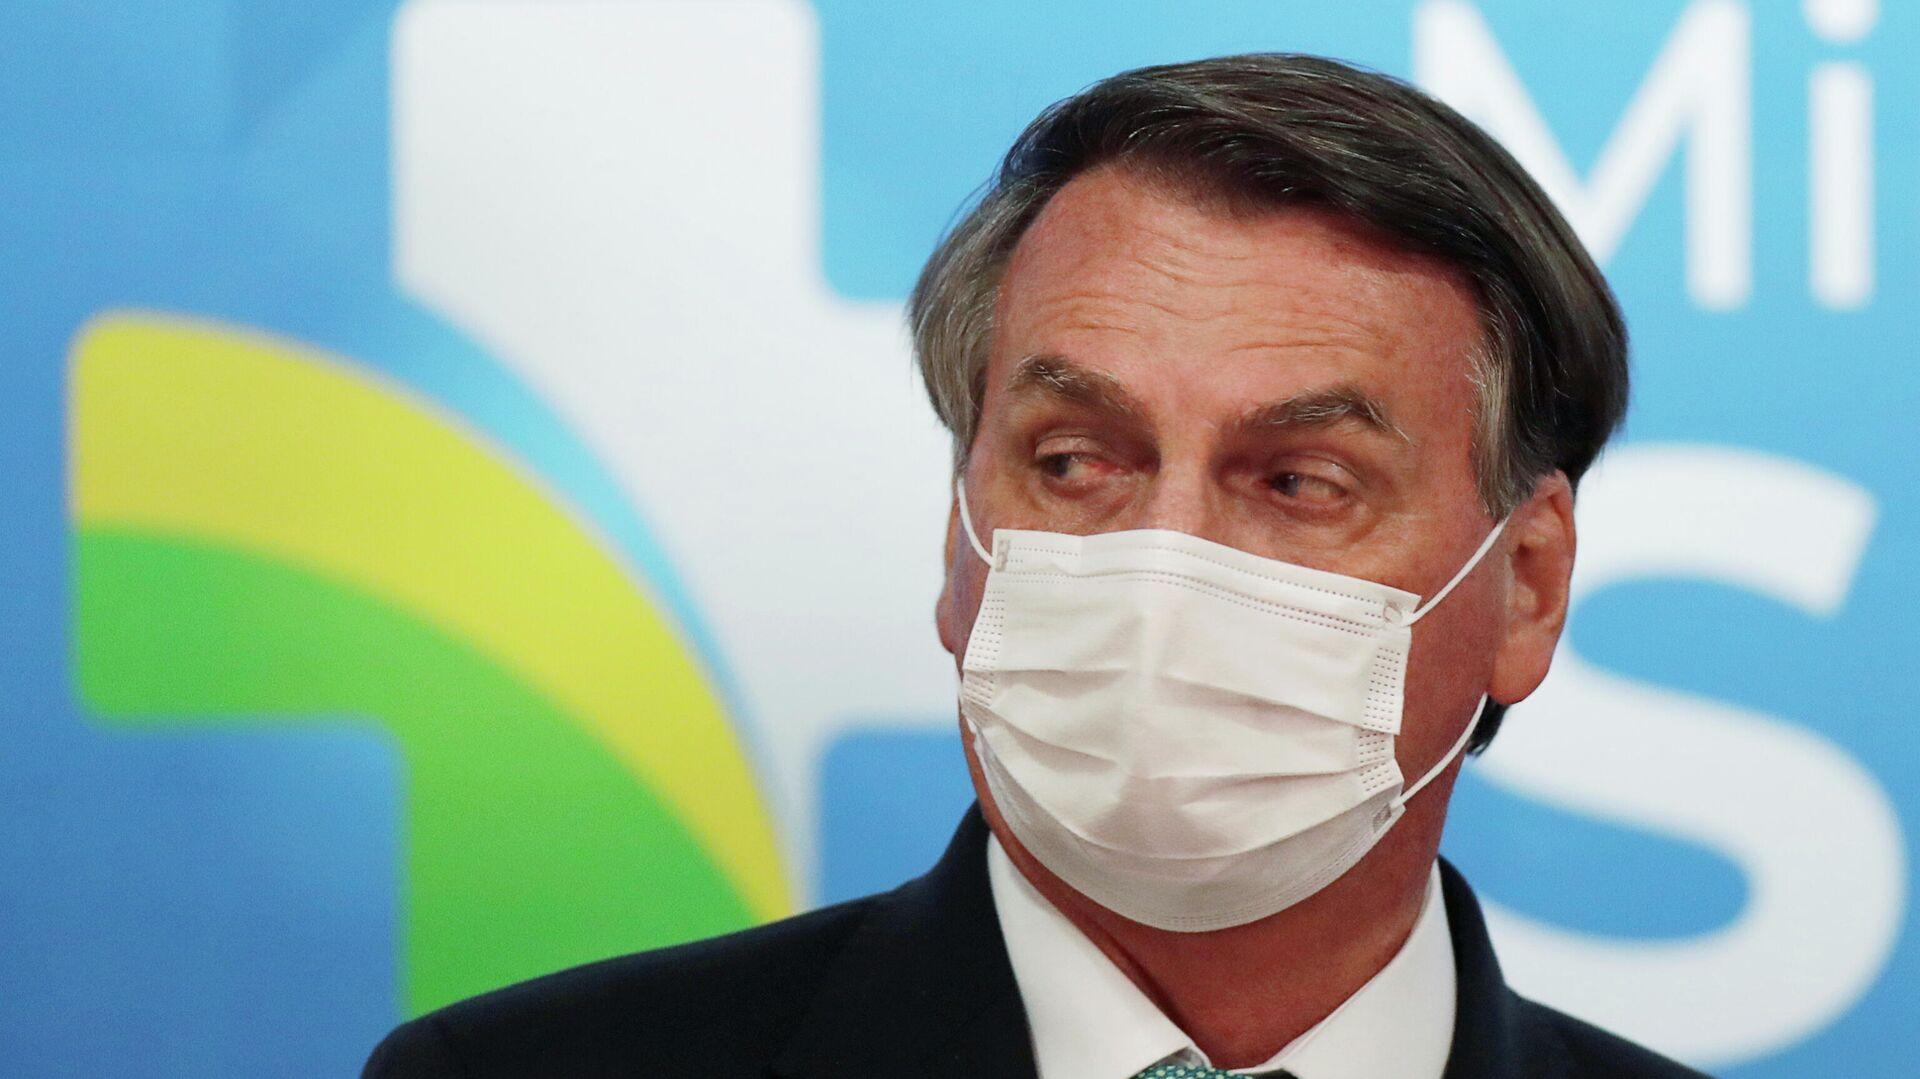 Jair Bolsonaro, presidente de Brasil - Sputnik Mundo, 1920, 15.06.2021